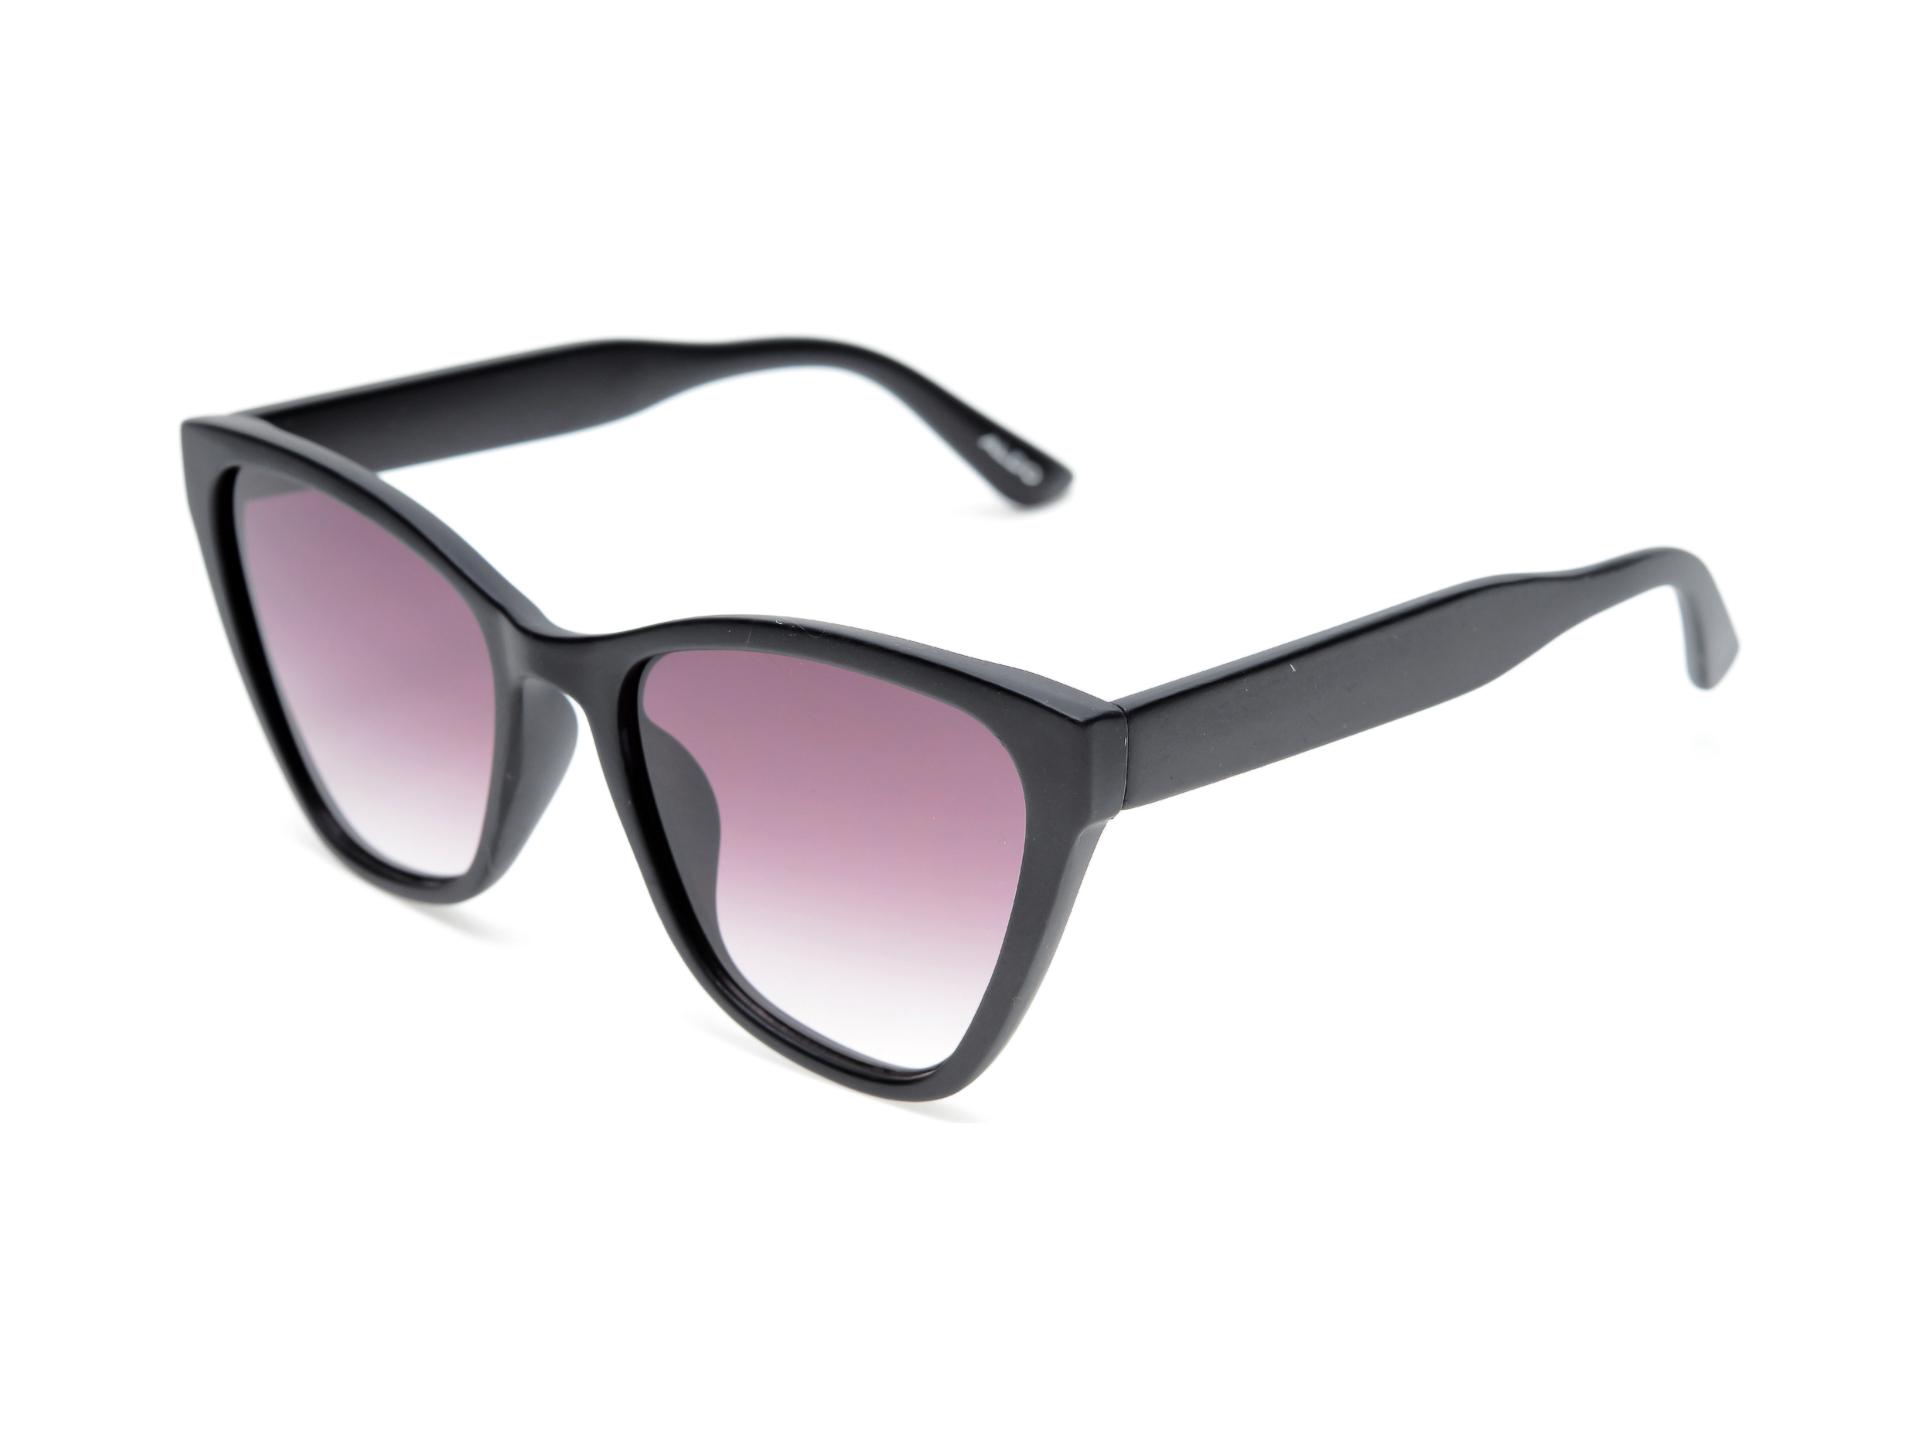 Ochelari de soare ALDO negri, Boskear001, din pvc imagine